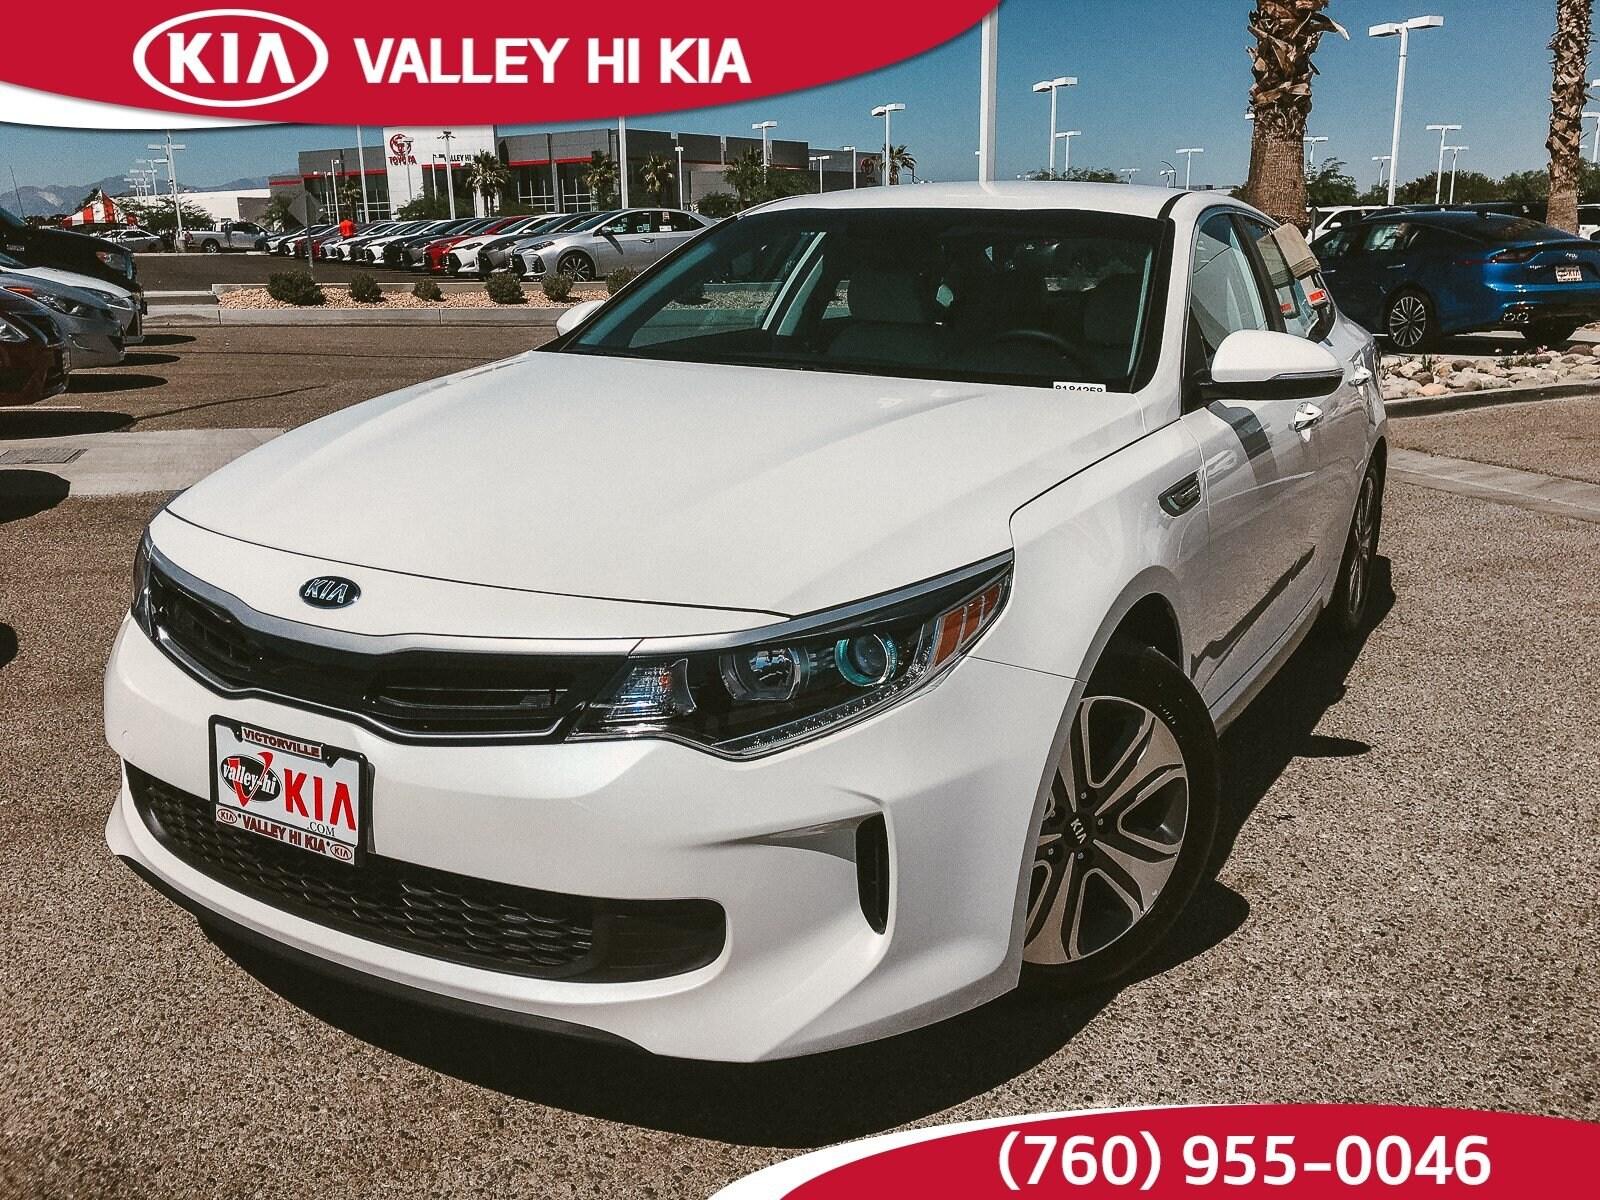 Valley Hi Kia >> 2019 Kia Optima Hybrid For Sale In Victorville Ca Valley Hi Kia